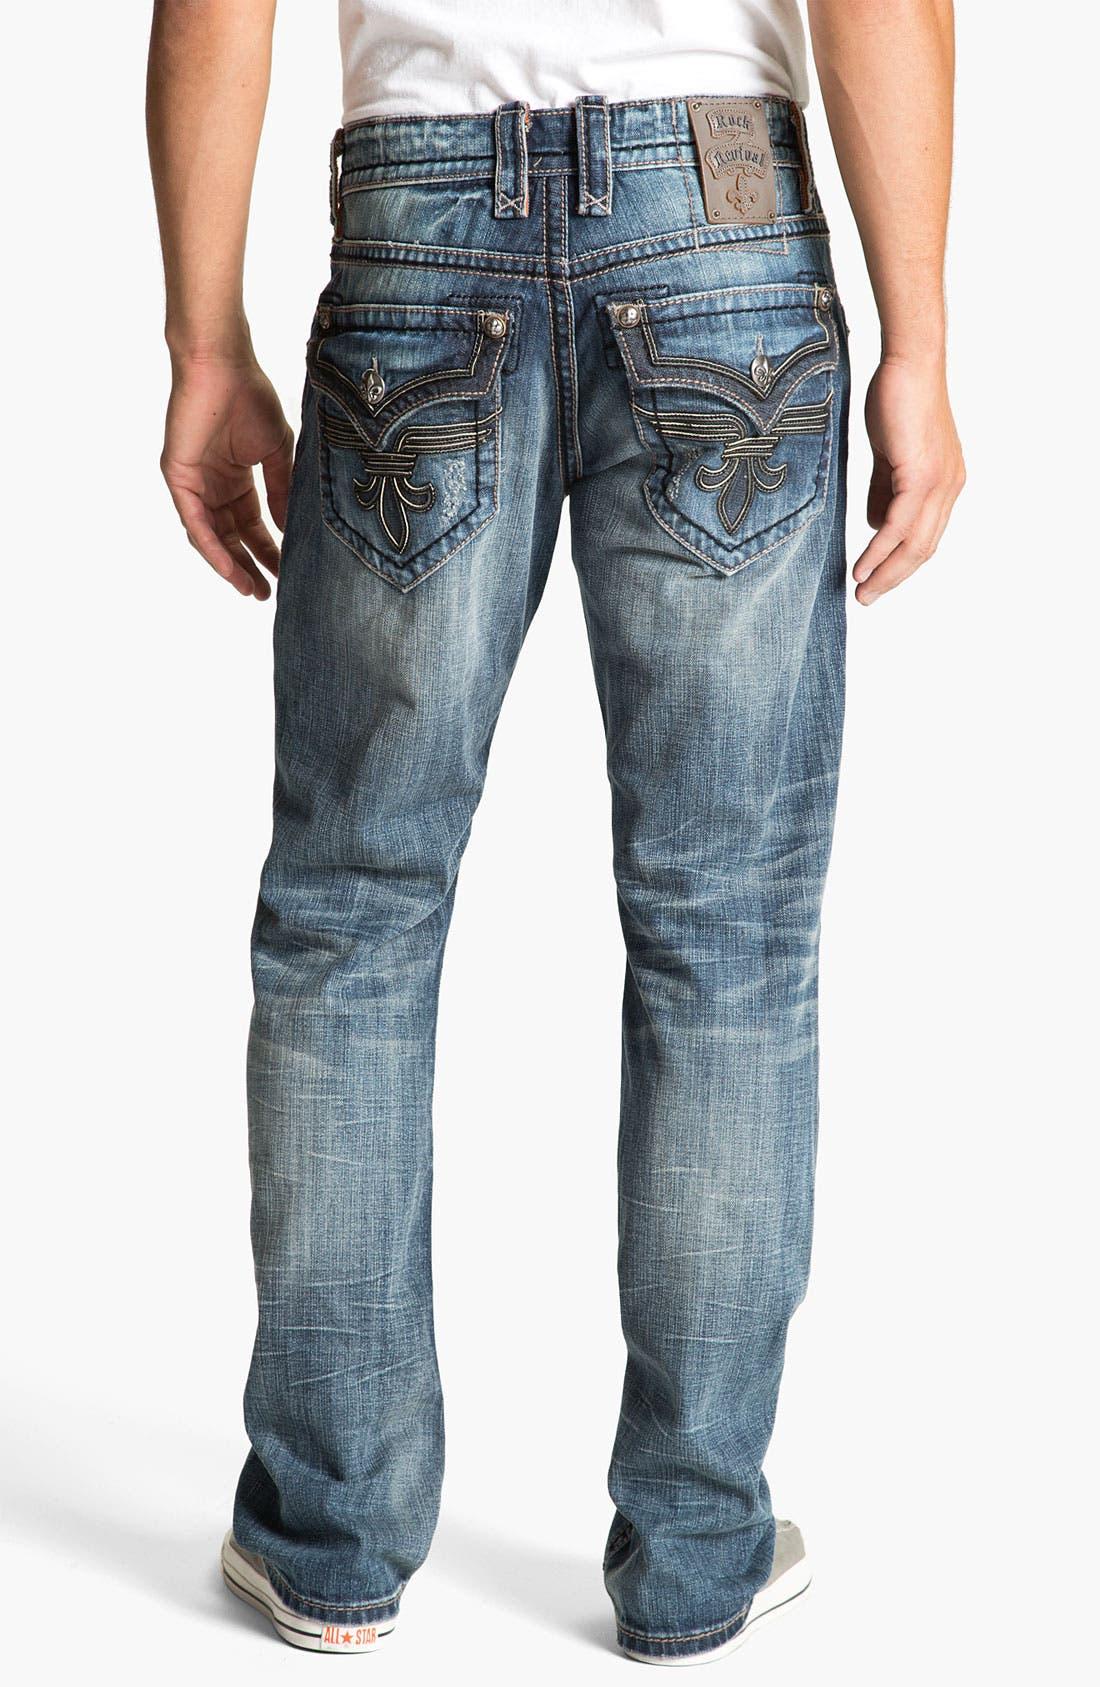 Alternate Image 1 Selected - Rock Revival 'Chopper' Straight Leg Jeans (Vintage Blue)